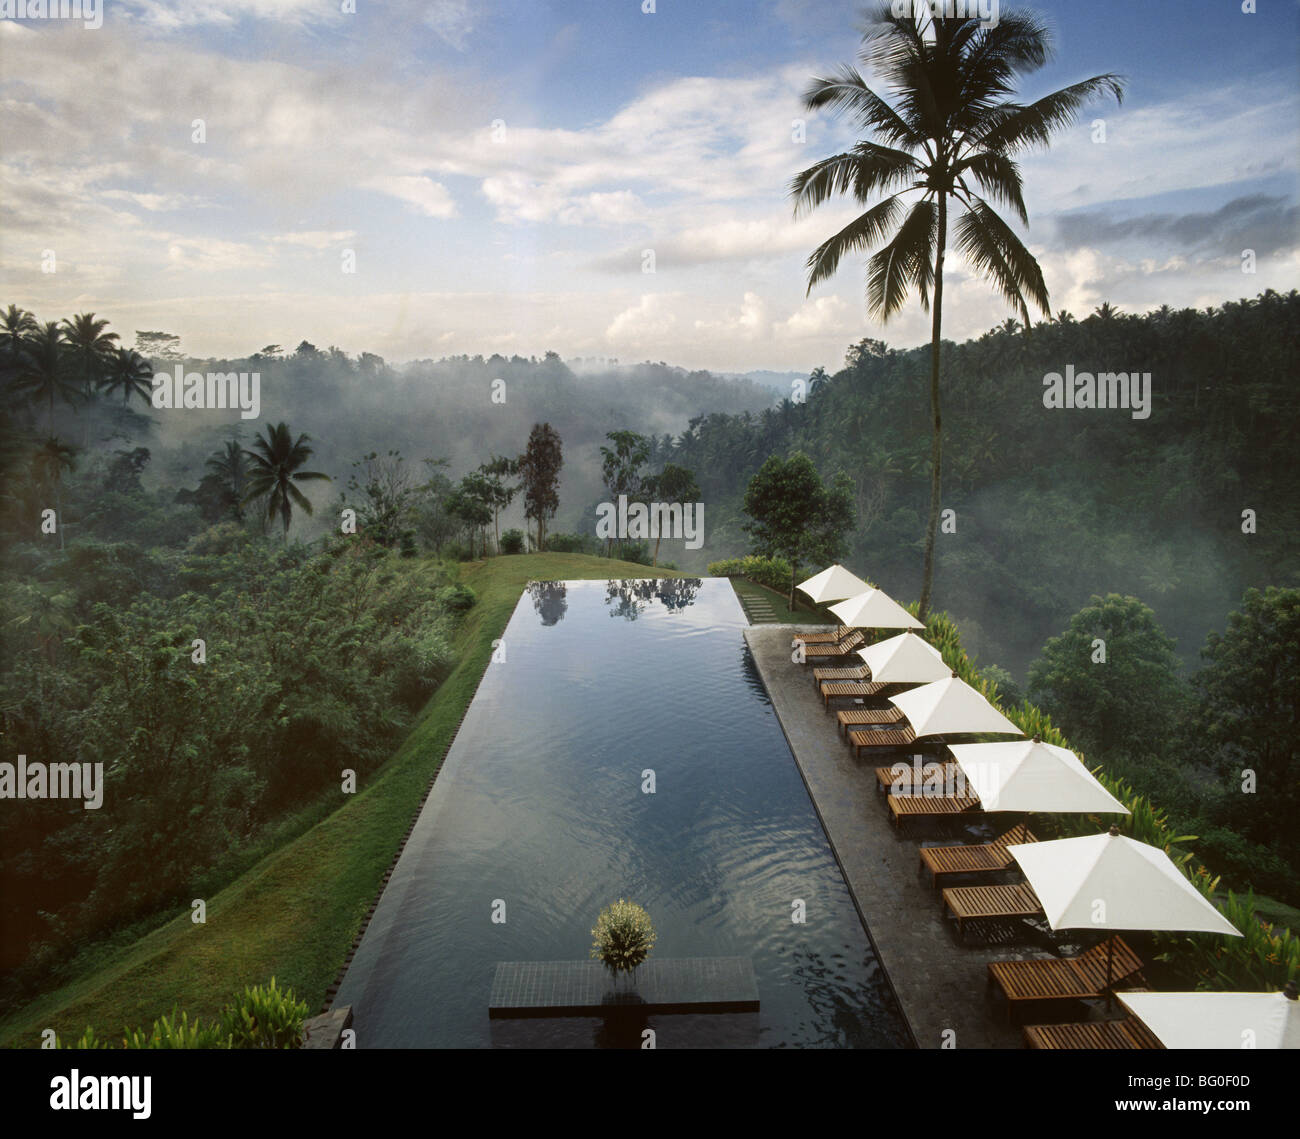 Pool of Alila Hotel Ubud, formerly The Chedi, Ubud, Bali, Indonesia, Southeast Asia, Asia Stock Photo